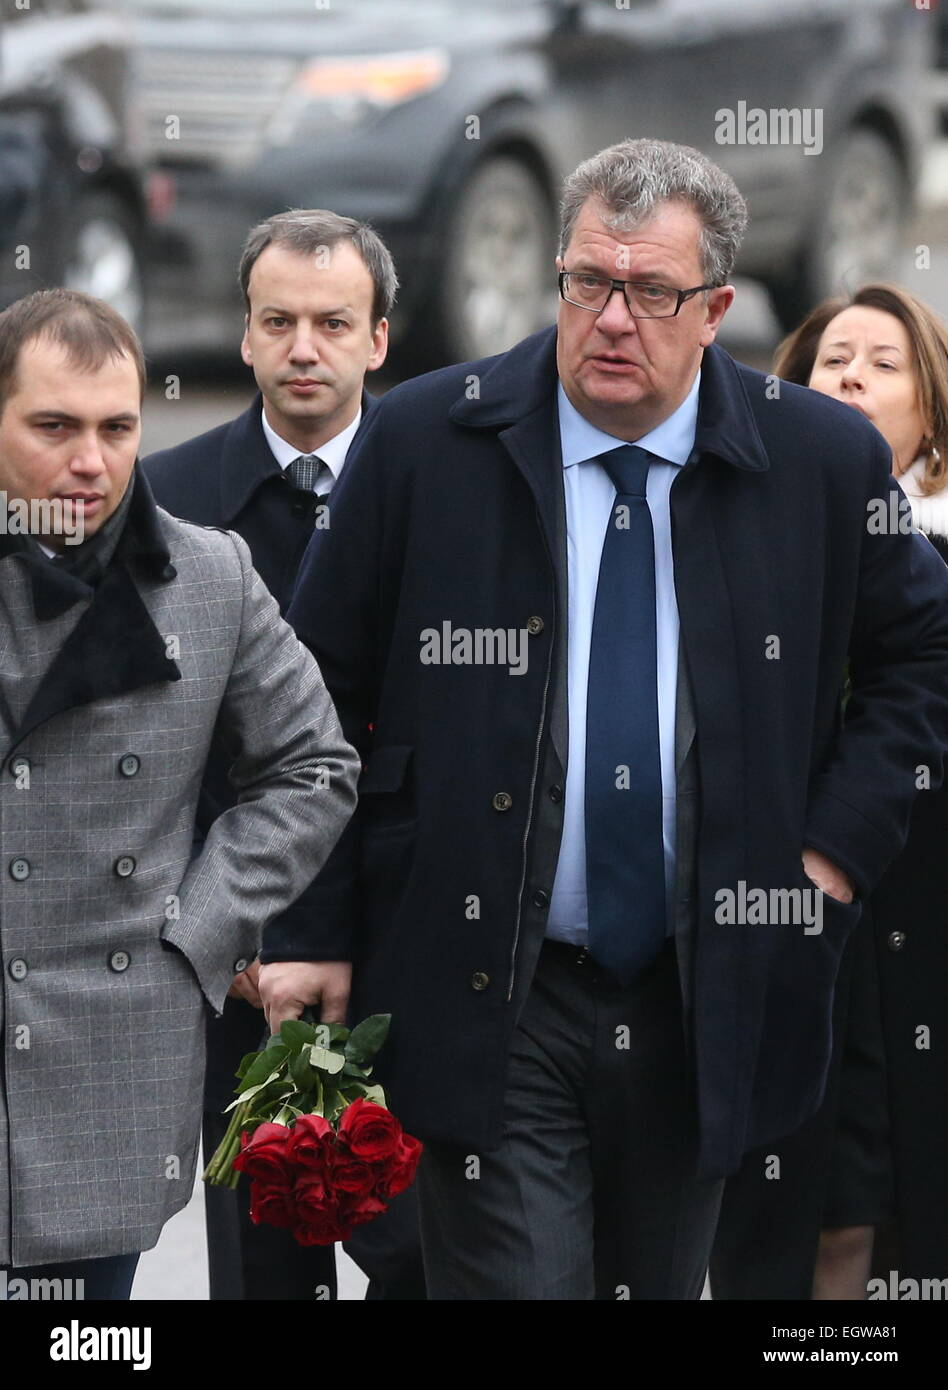 Ksenia Sobchak and Sergey Kapkov split up 05/18/2011 33